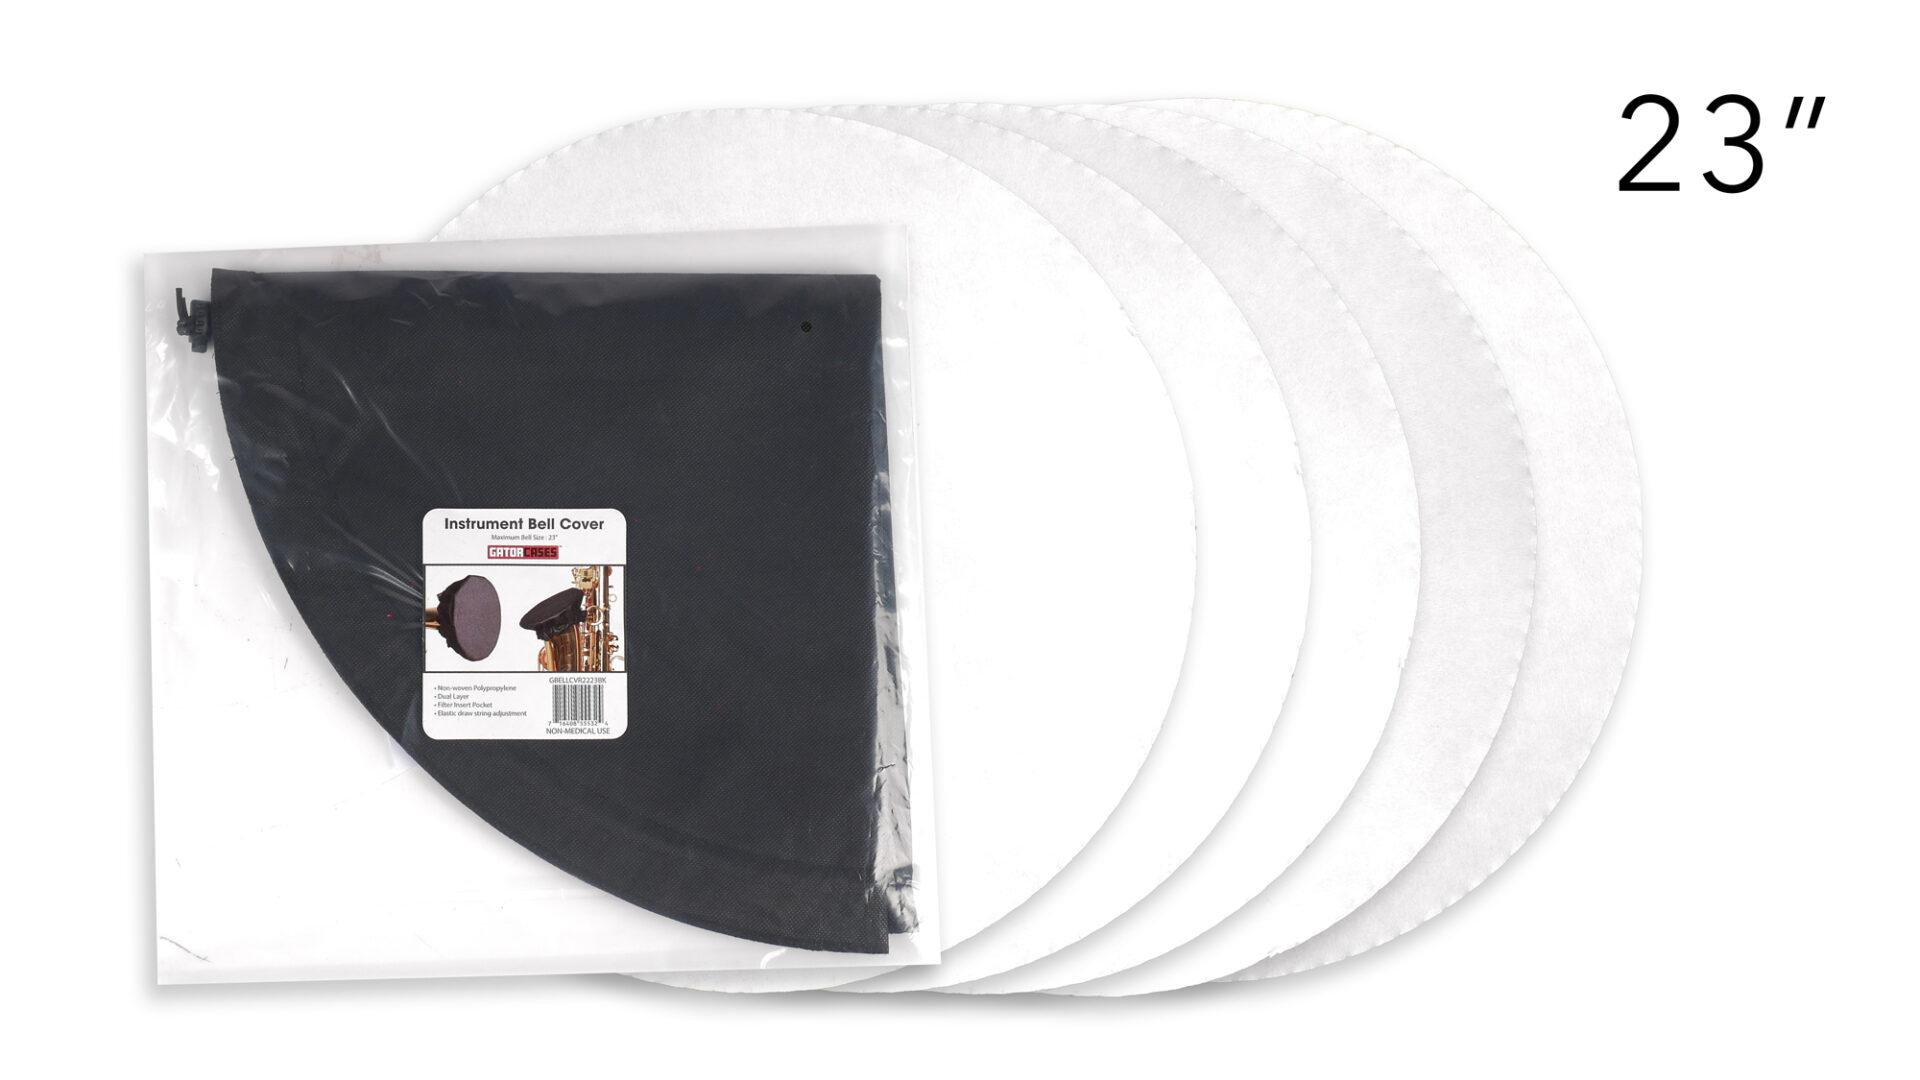 Gbellcvr2223filter Gbom Package